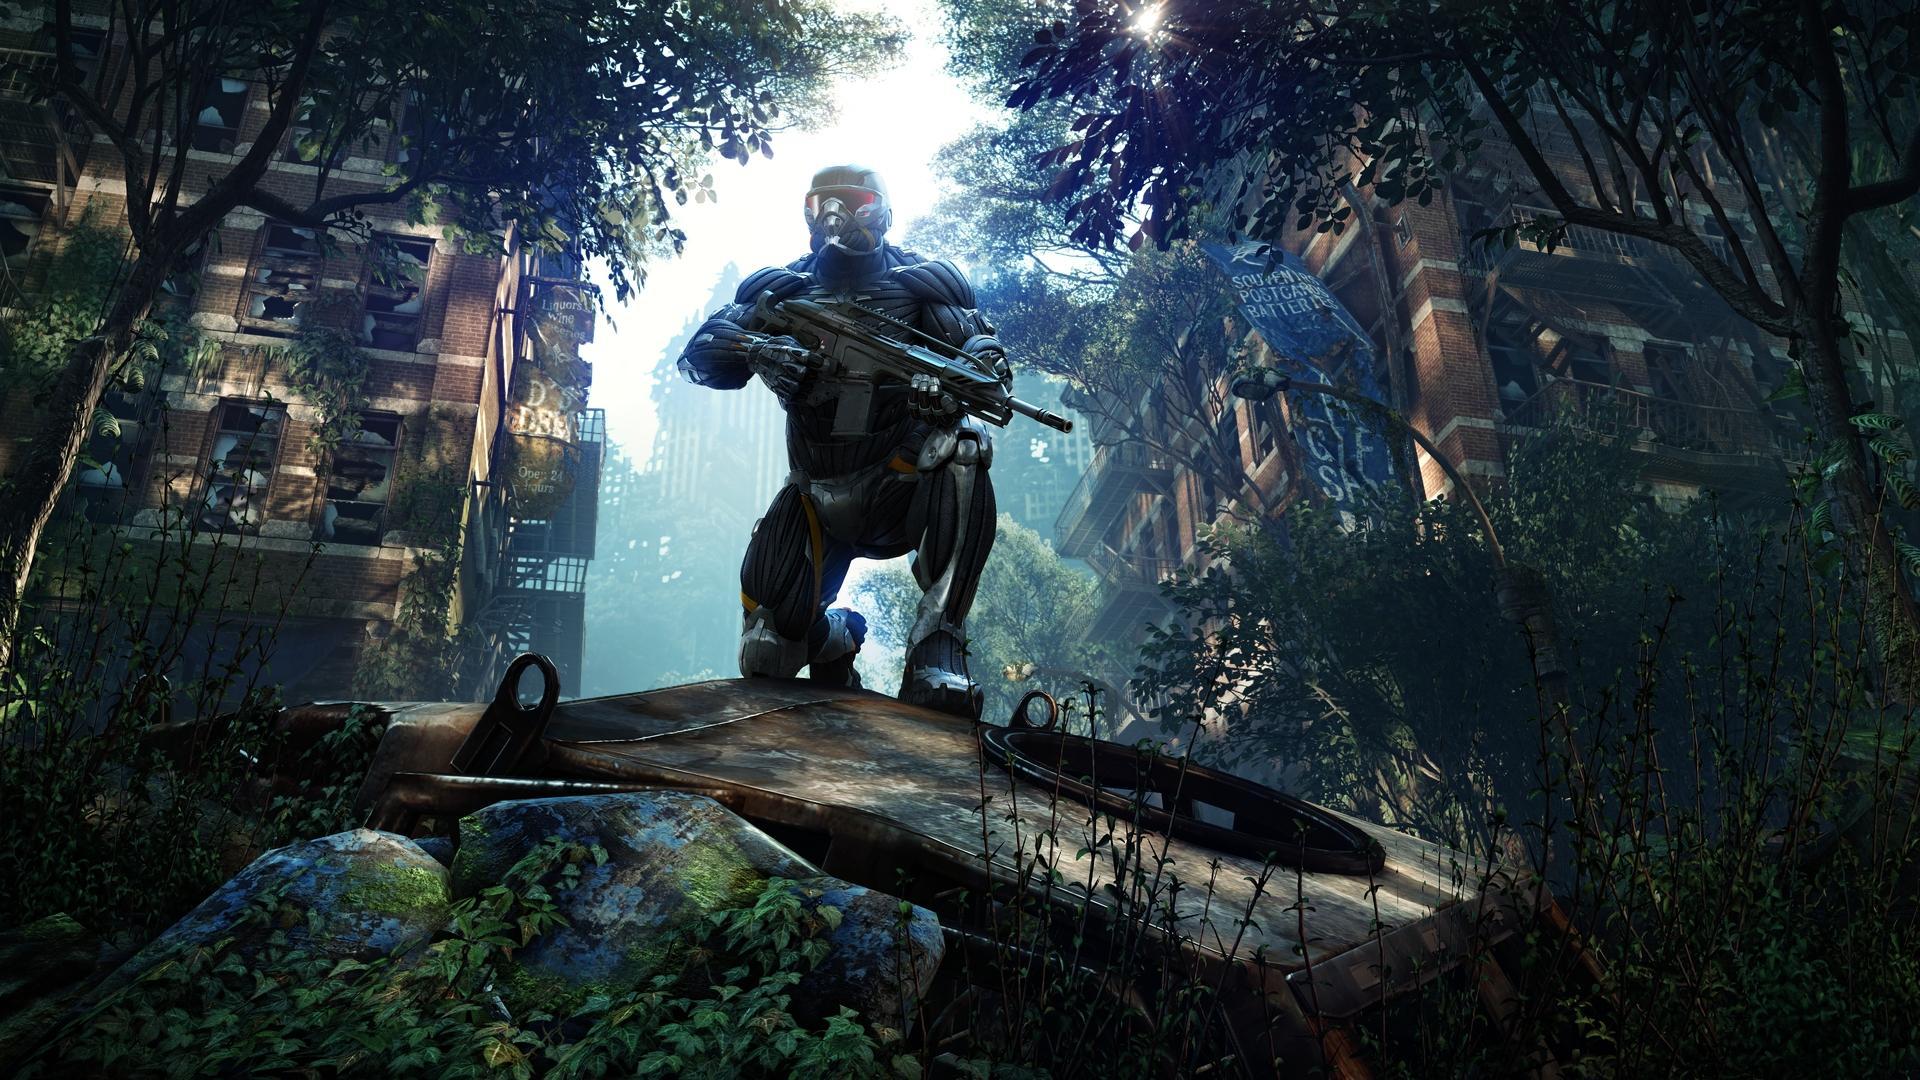 Арт к игре Crysis 3